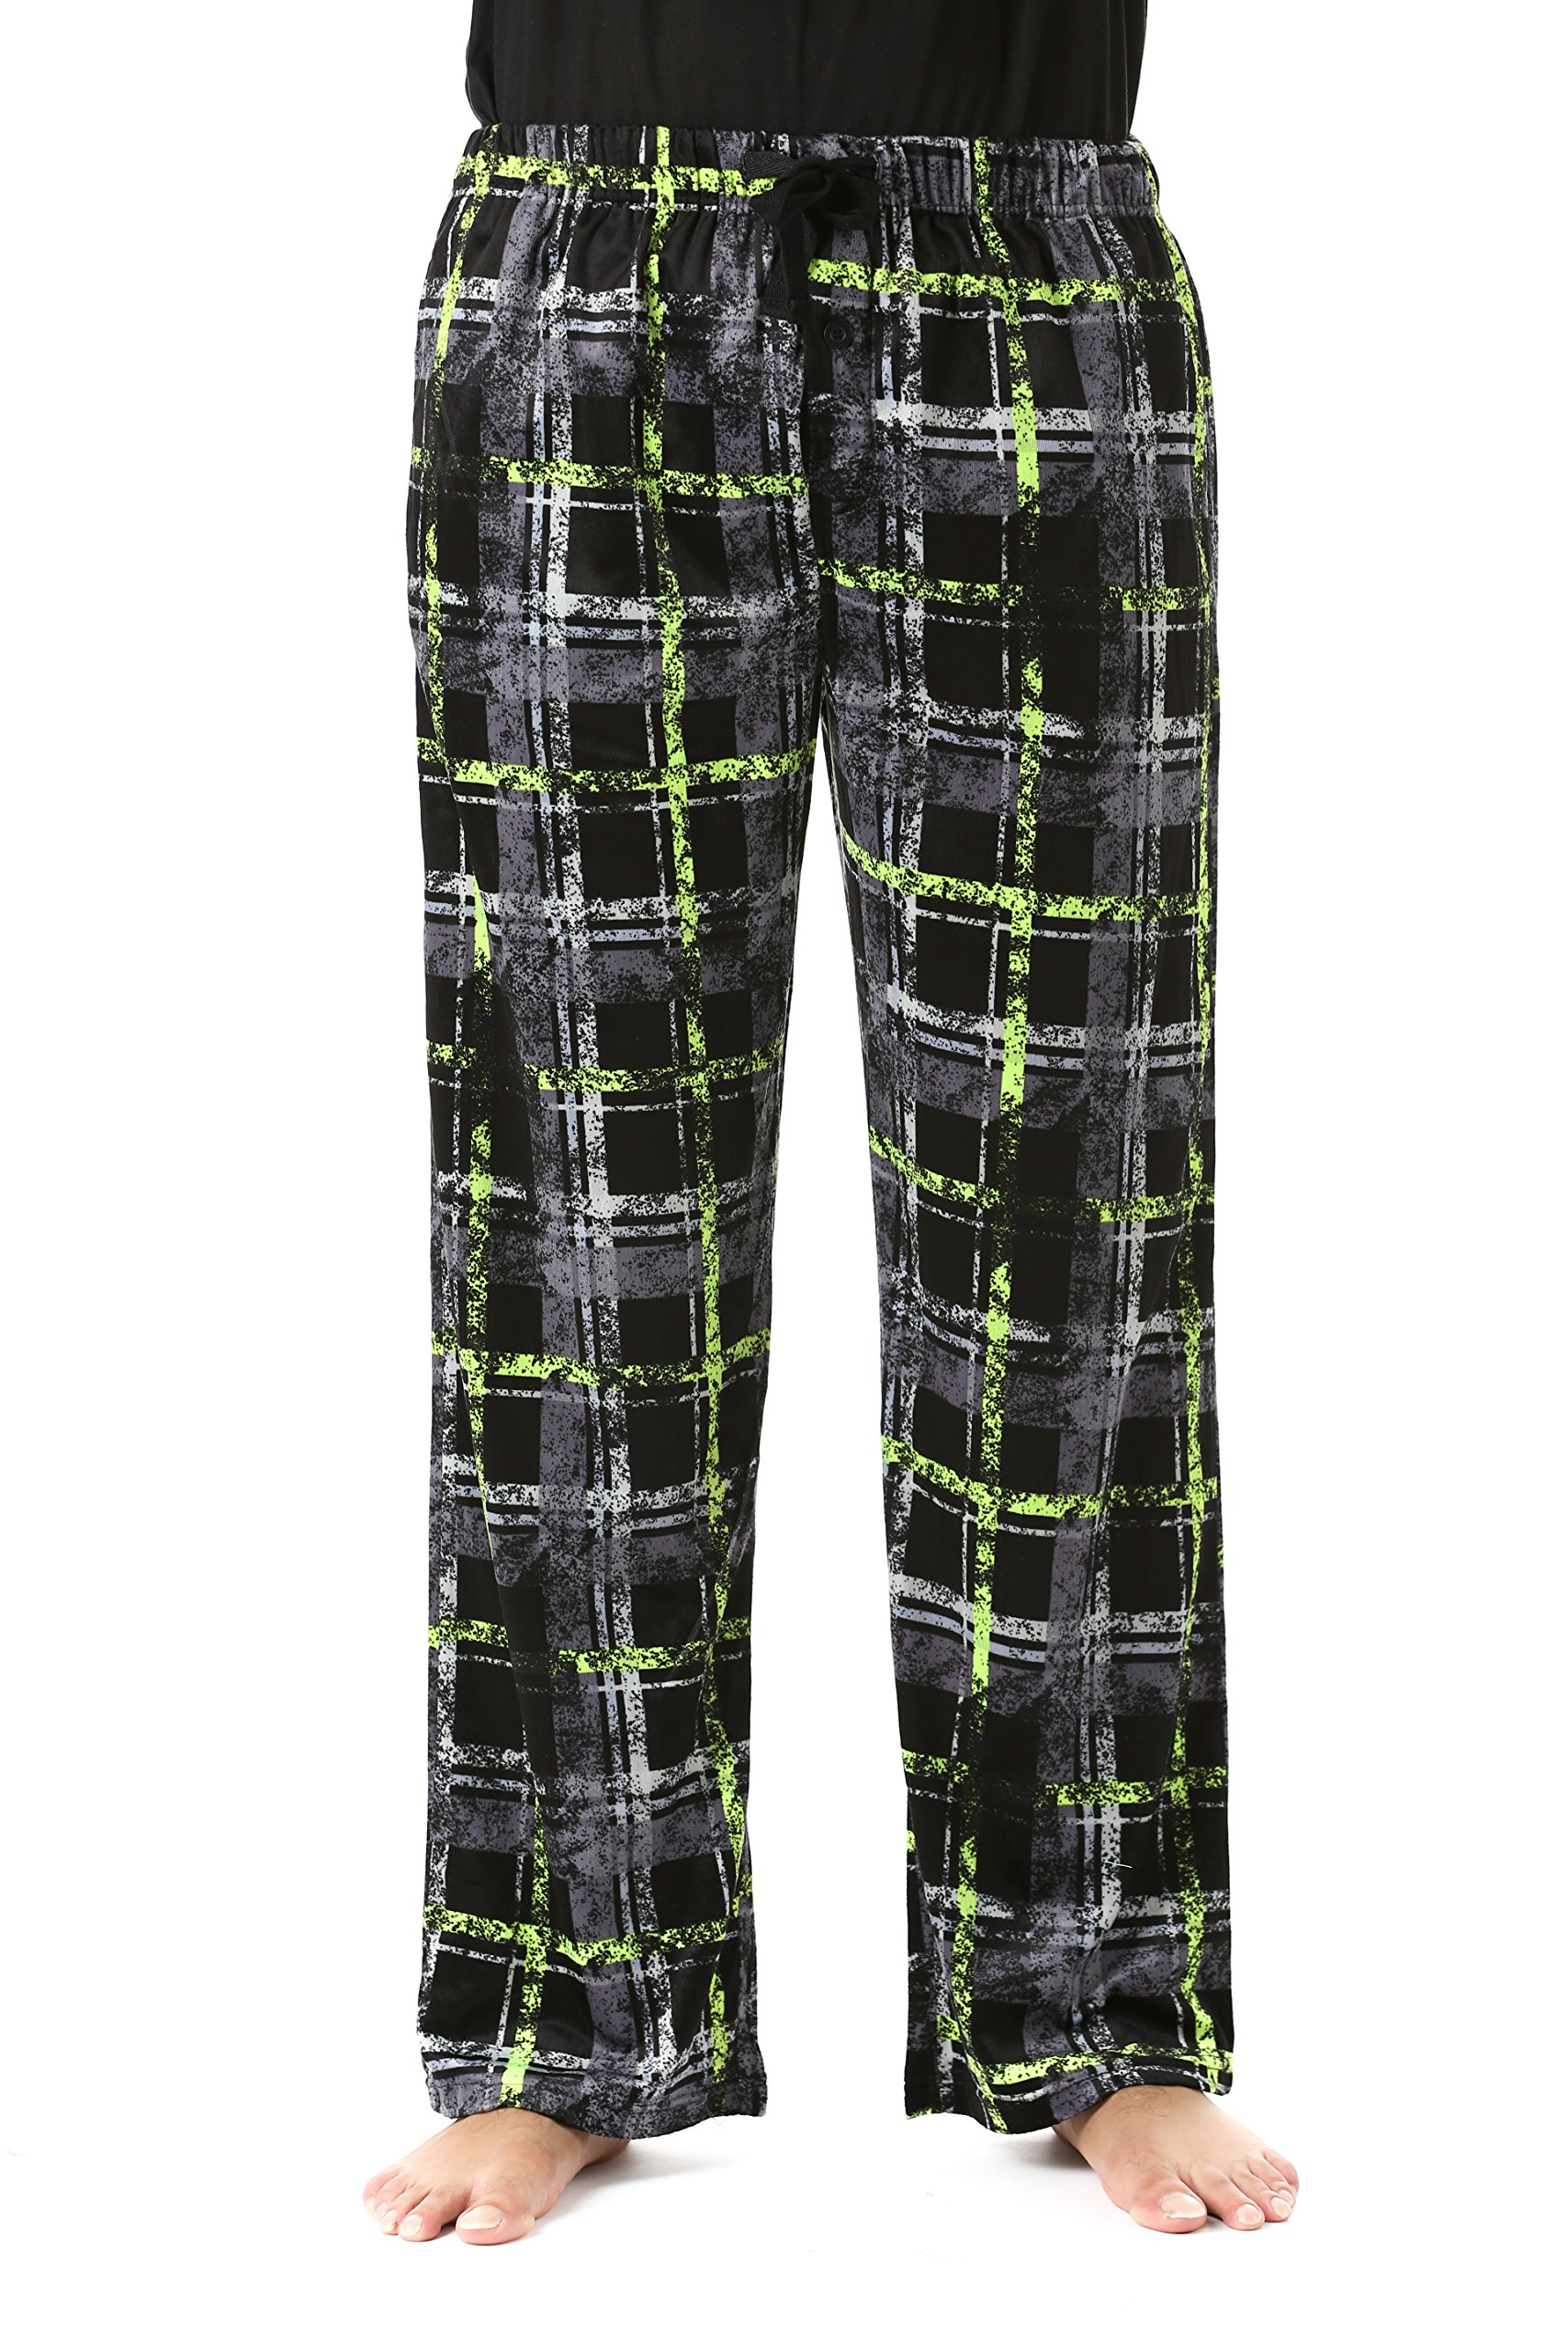 #FollowMe 45903-2C-XL Fleece Pajama Pants for Men/Sleepwear/PJs,Plaid 2c,X-Large